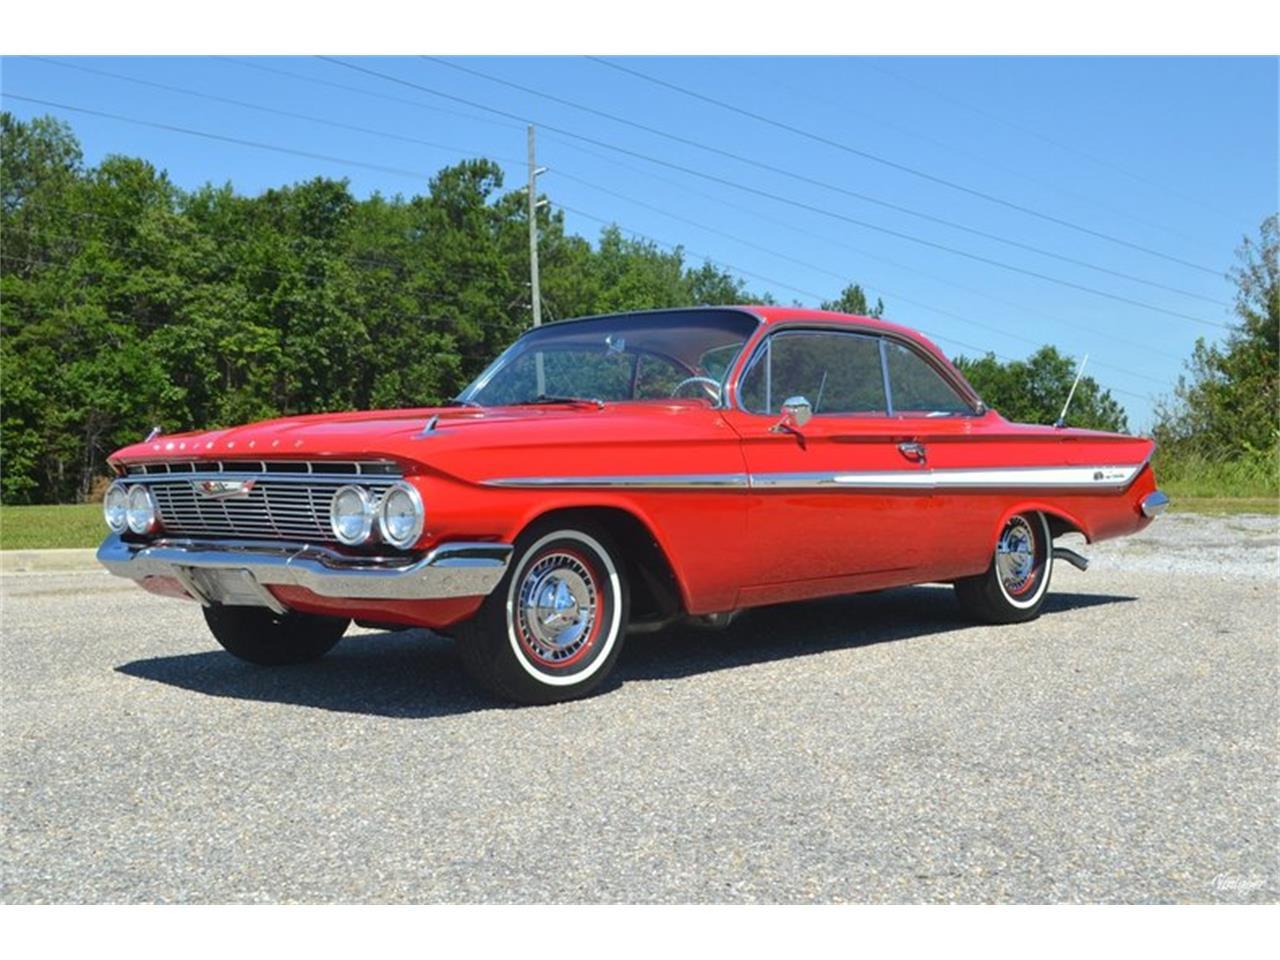 61 Impala For Sale >> For Sale 1961 Chevrolet Impala In Alabaster Alabama